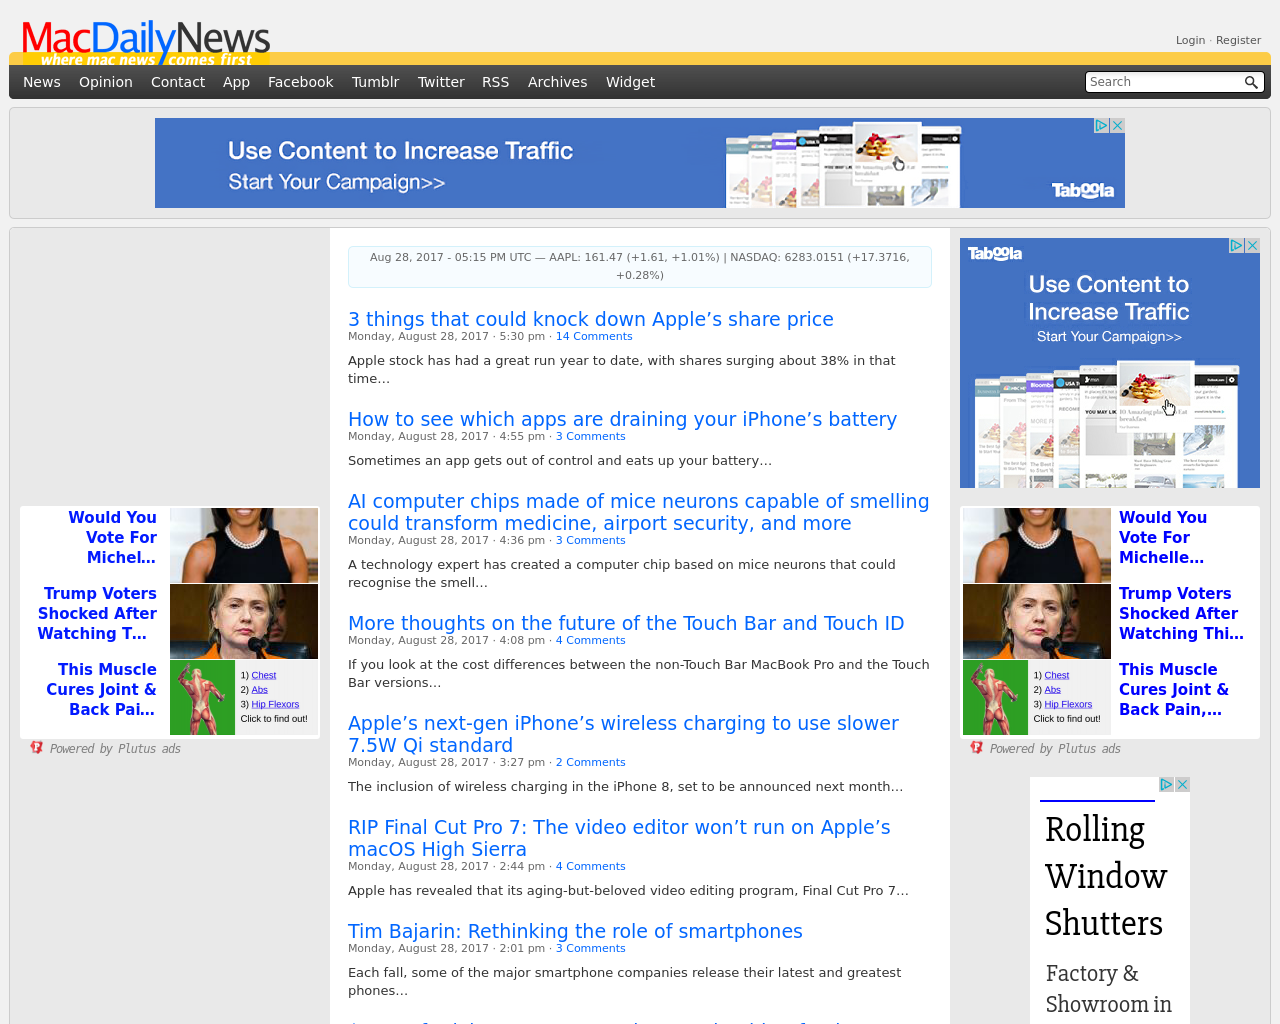 MacDailyNews-Advertising-Reviews-Pricing